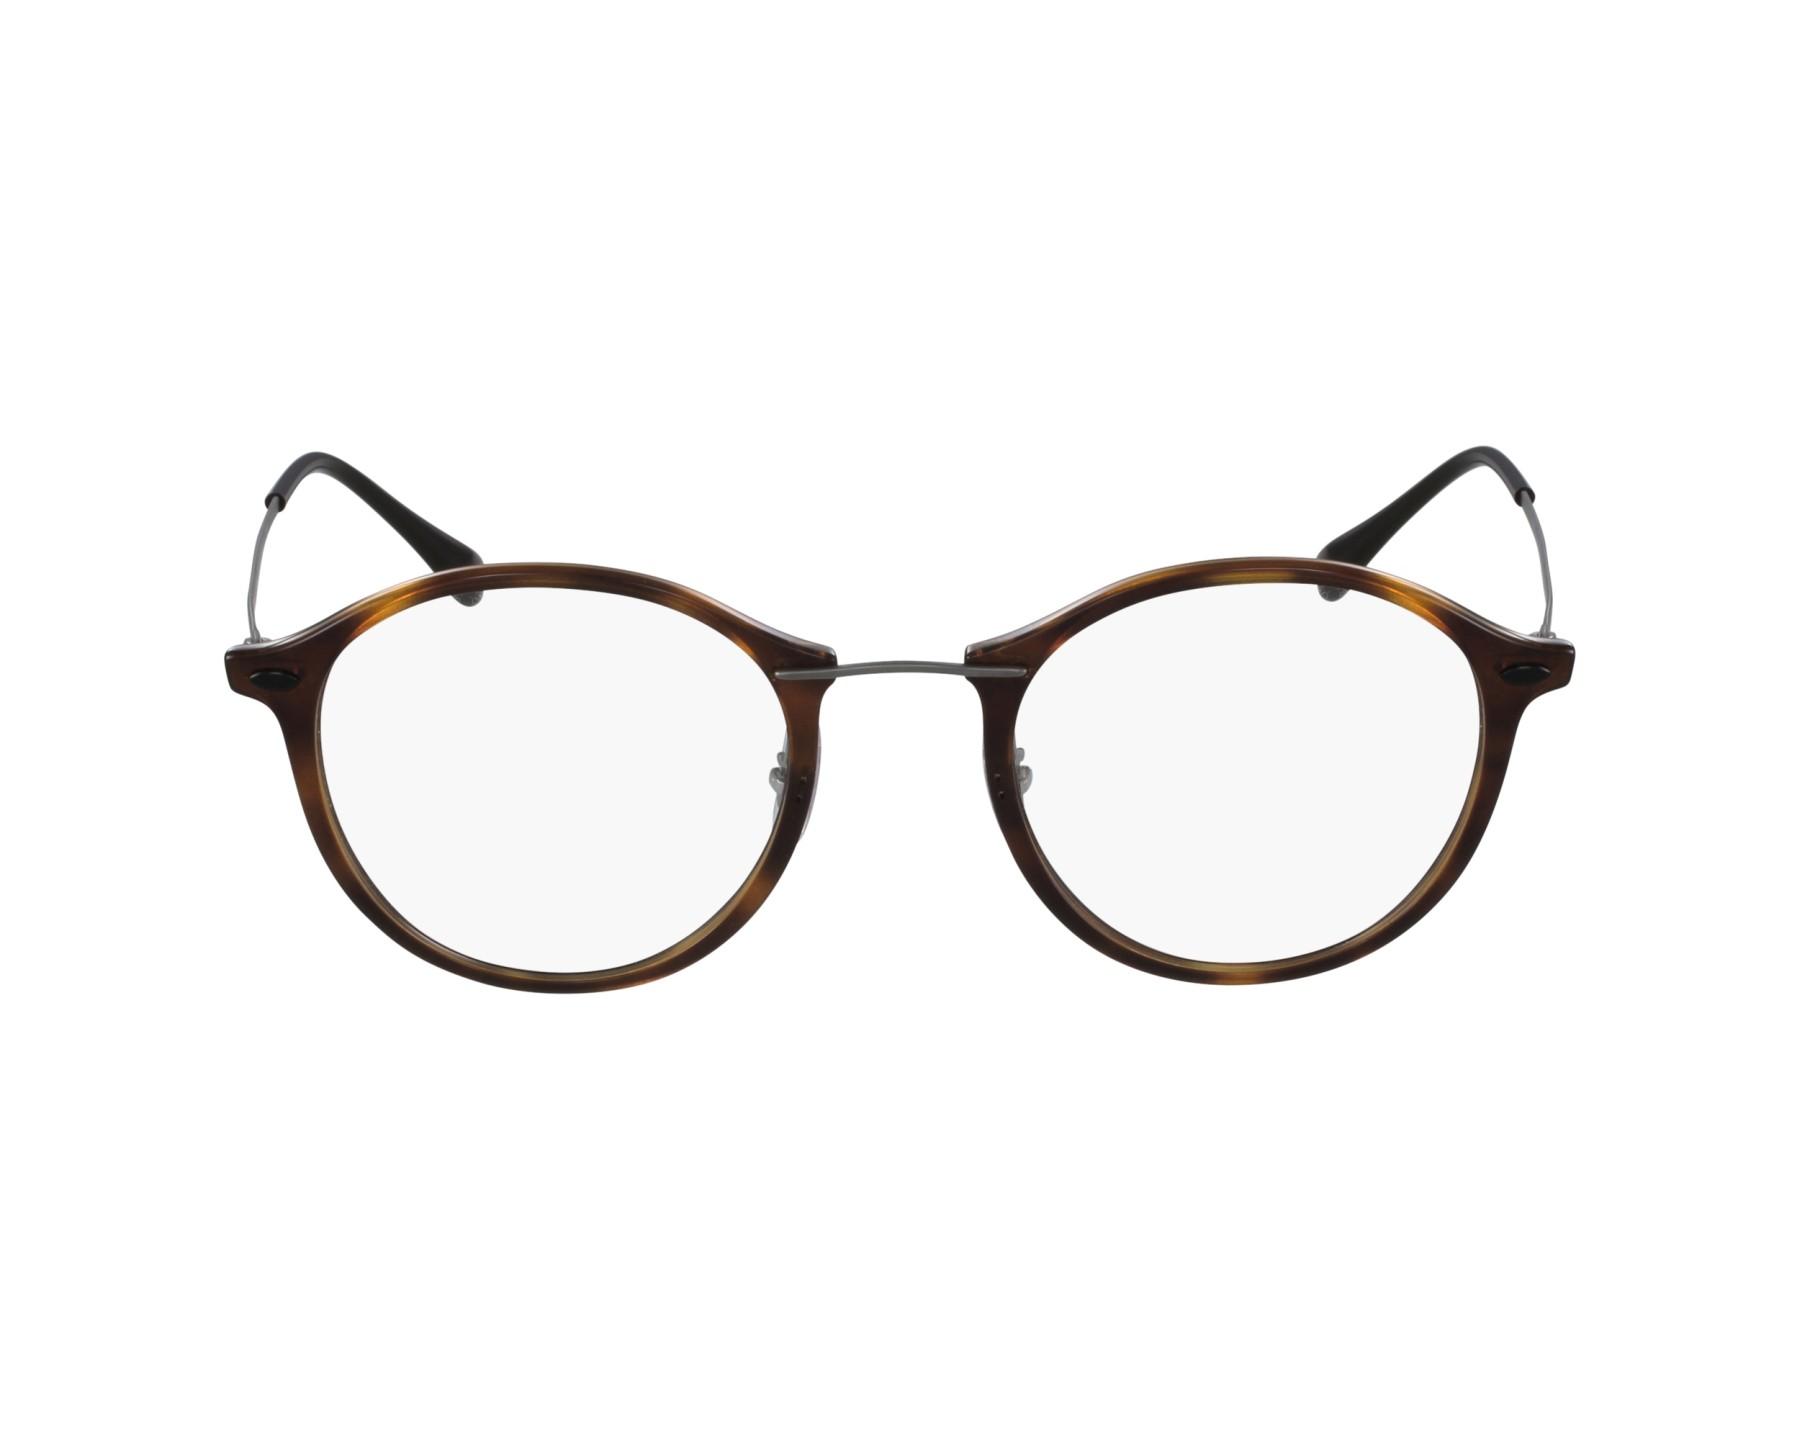 ray ban brillen aktuelle kollektion louisiana bucket brigade. Black Bedroom Furniture Sets. Home Design Ideas